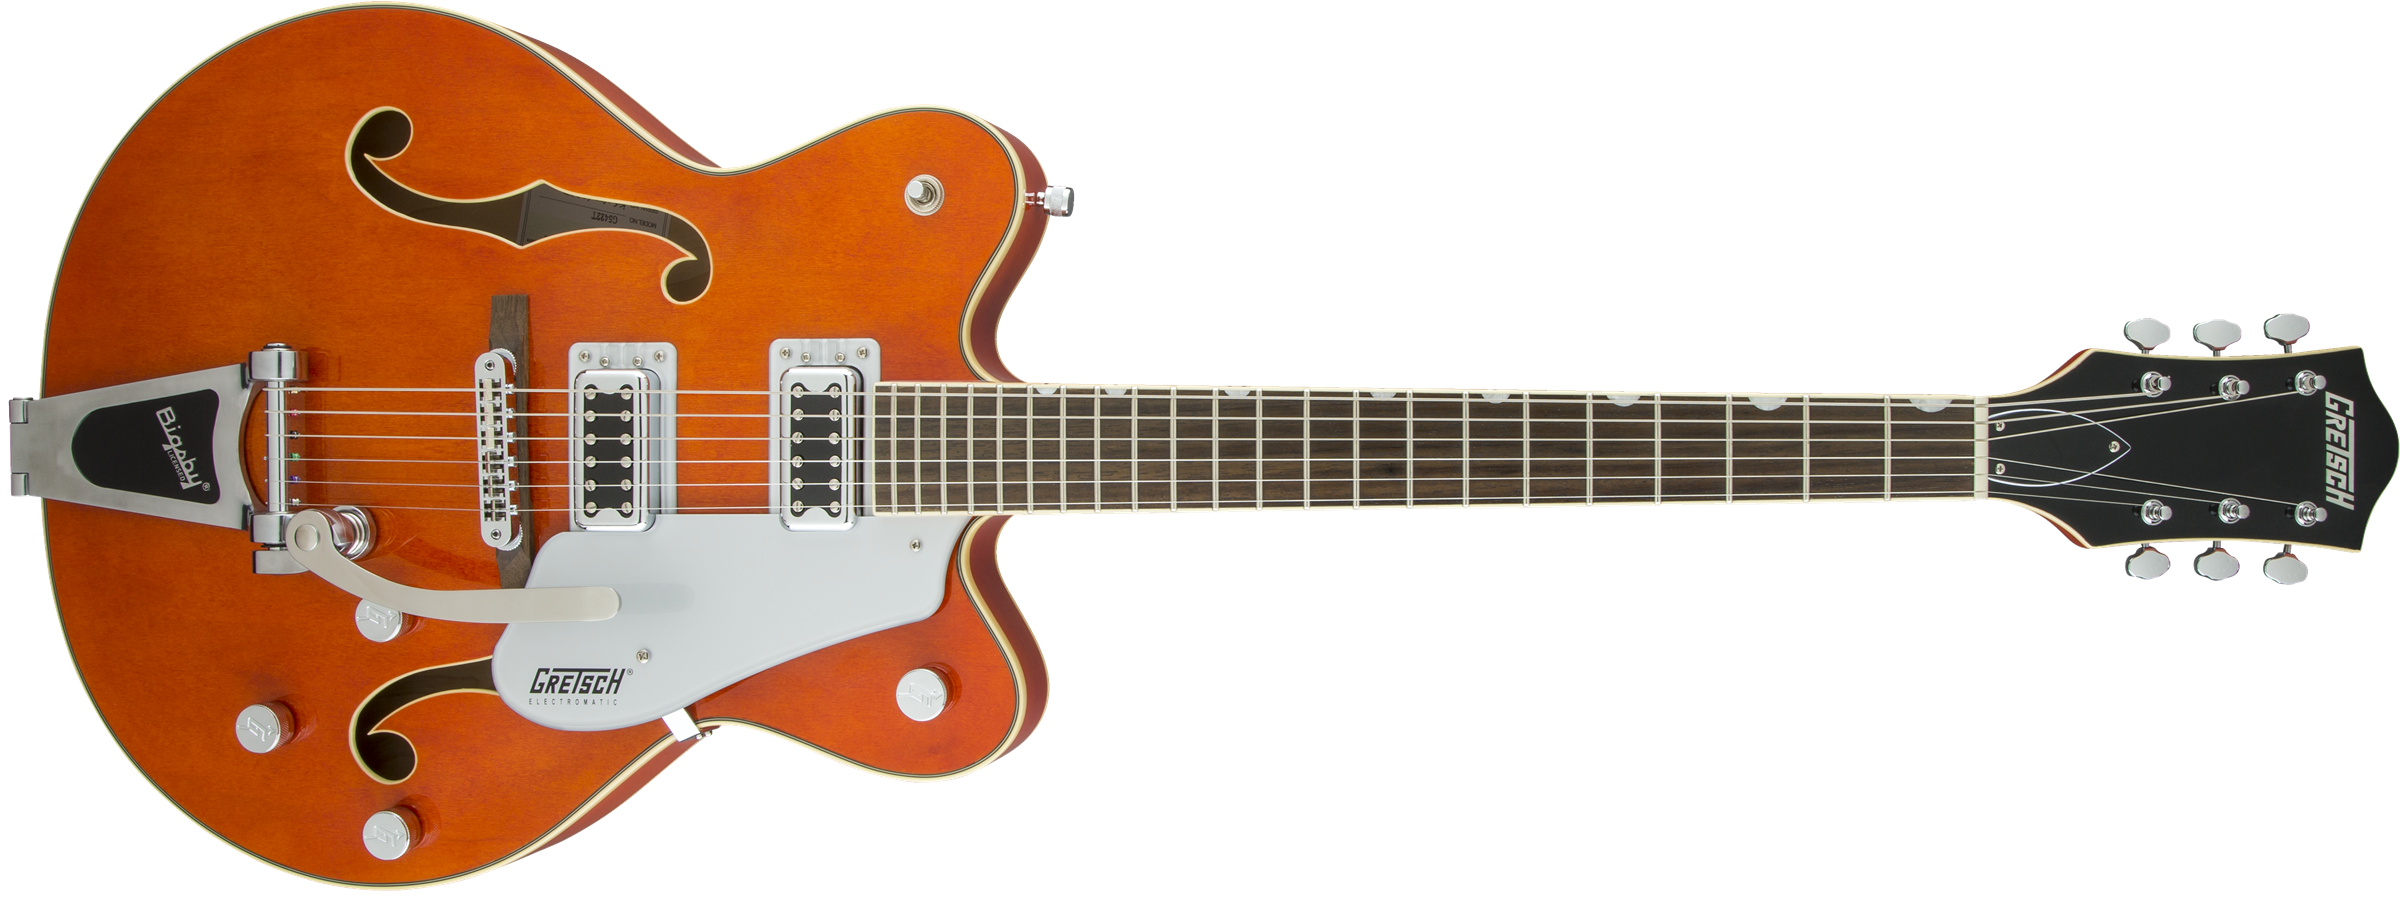 dating gretsch guitars electromatic g2162